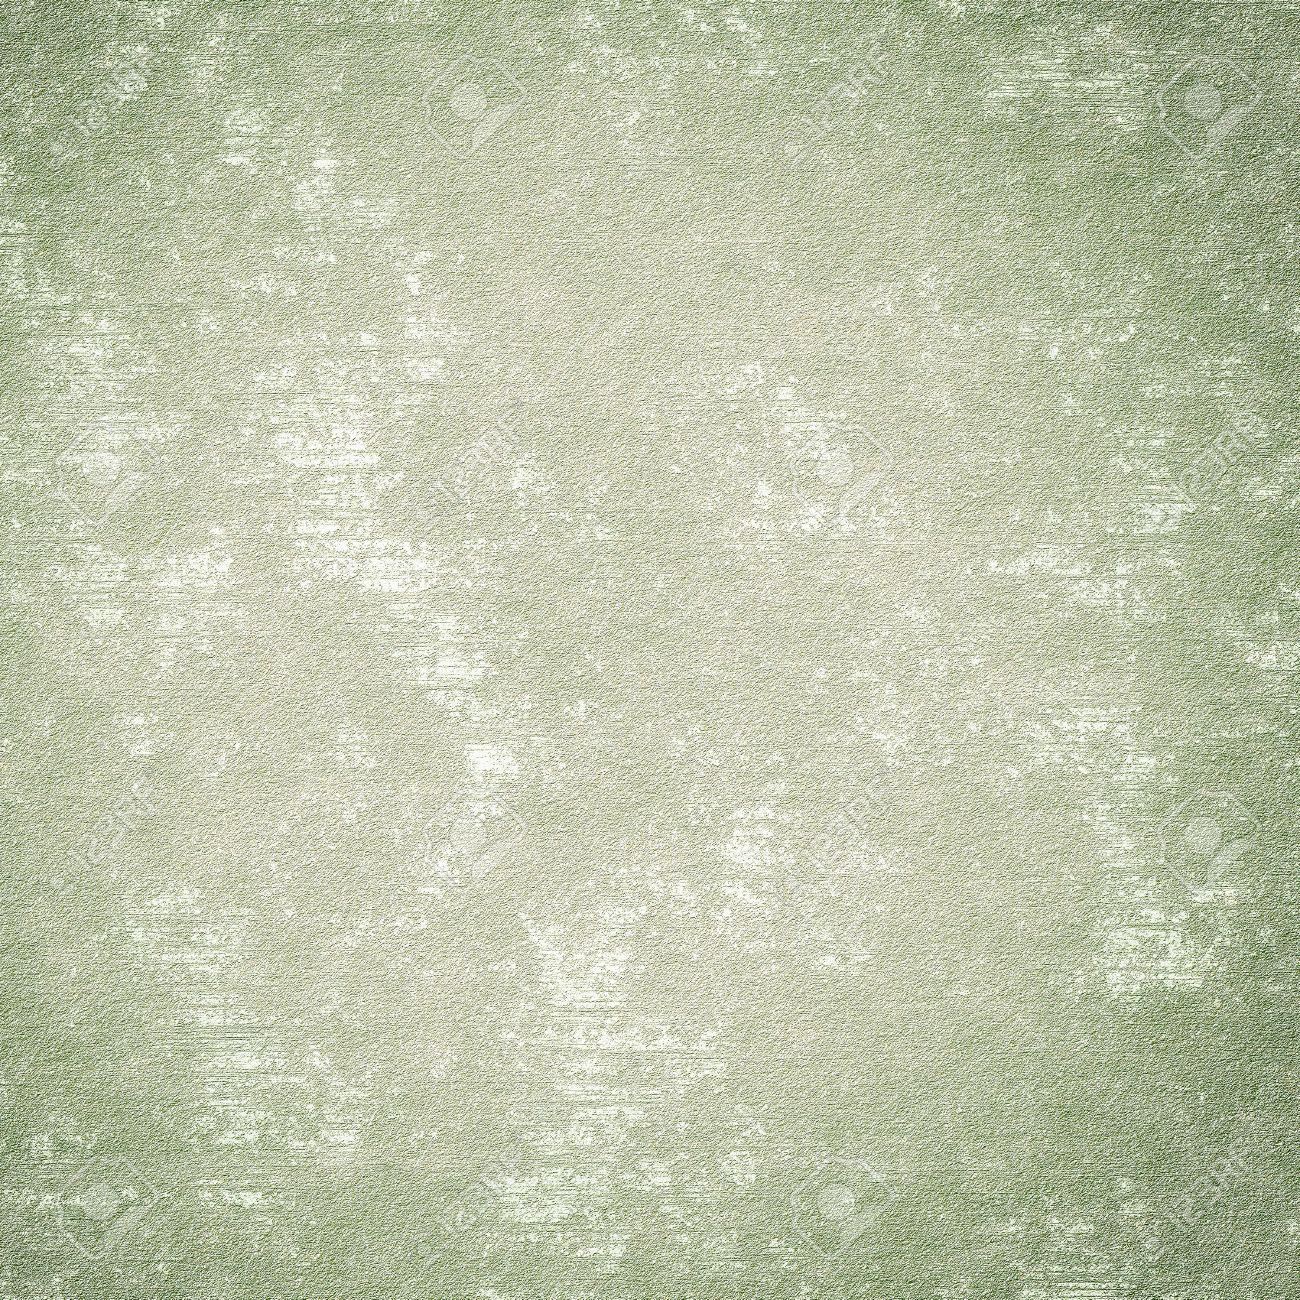 Muur textuur achtergrond, geschilderd groene pastel kleuren ...